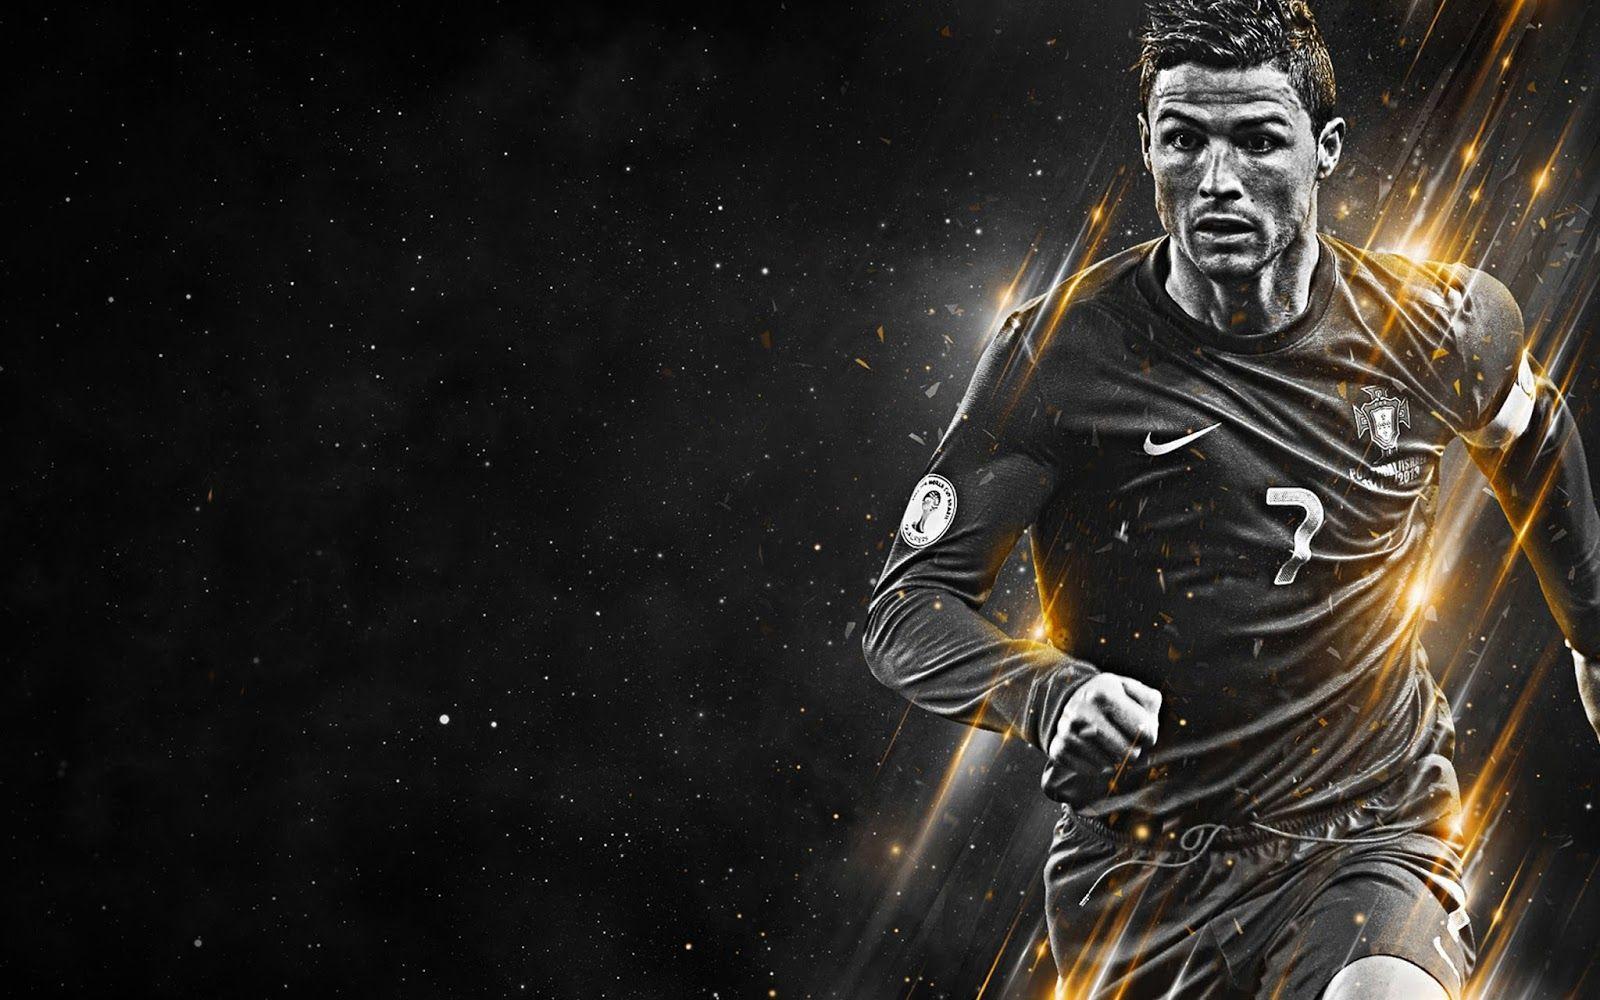 Cristiano Ronaldo Cool Wallpapers Top Free Cristiano Ronaldo Cool Backgrounds Wallpaperaccess